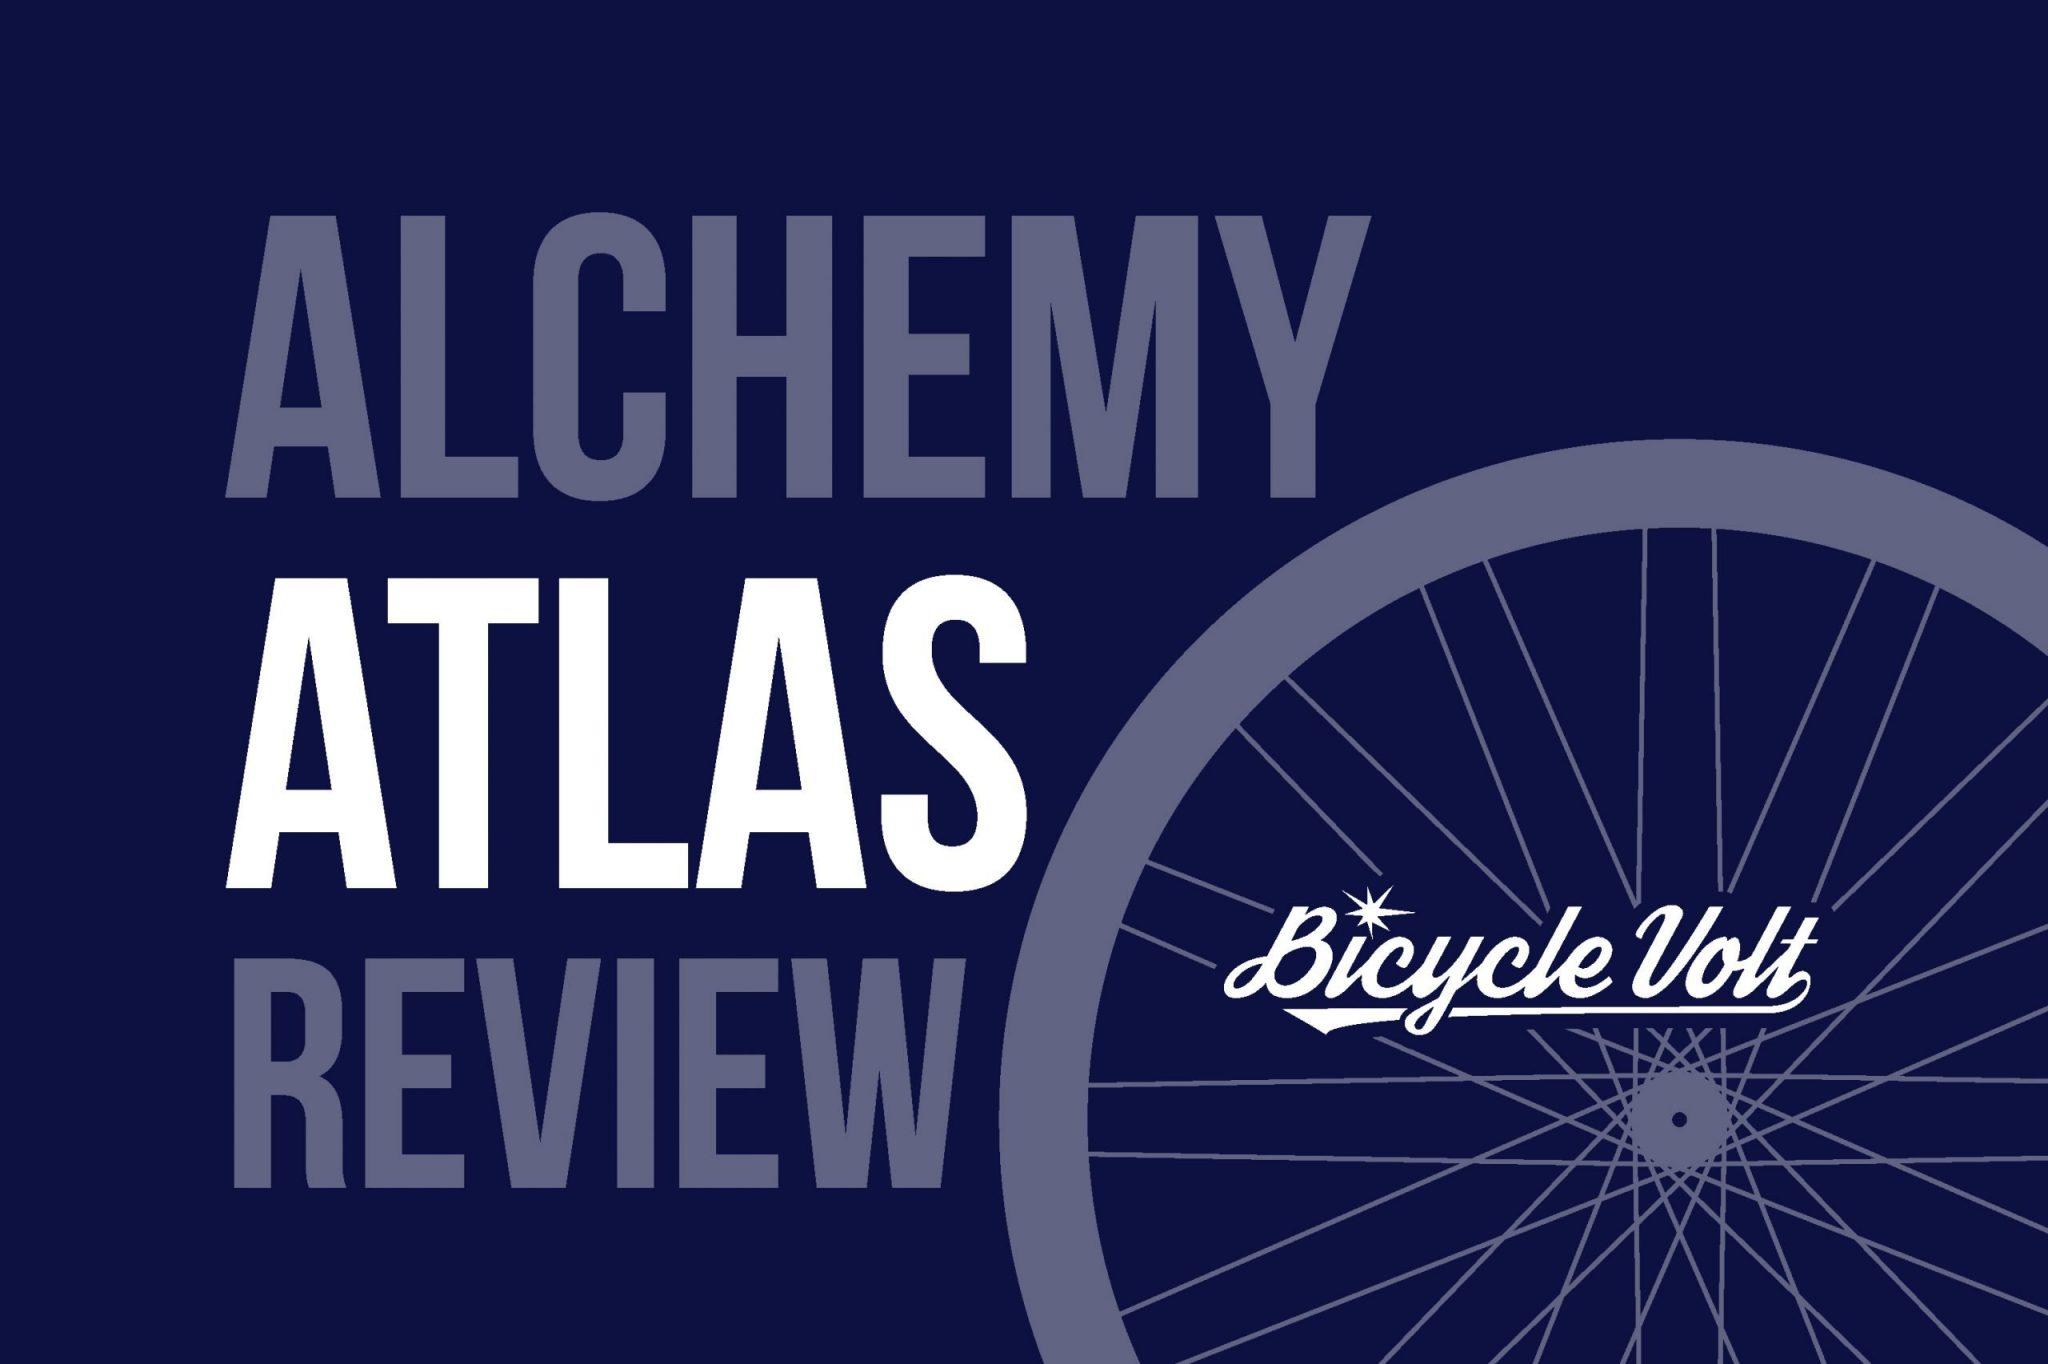 Alchemy Atlas Review